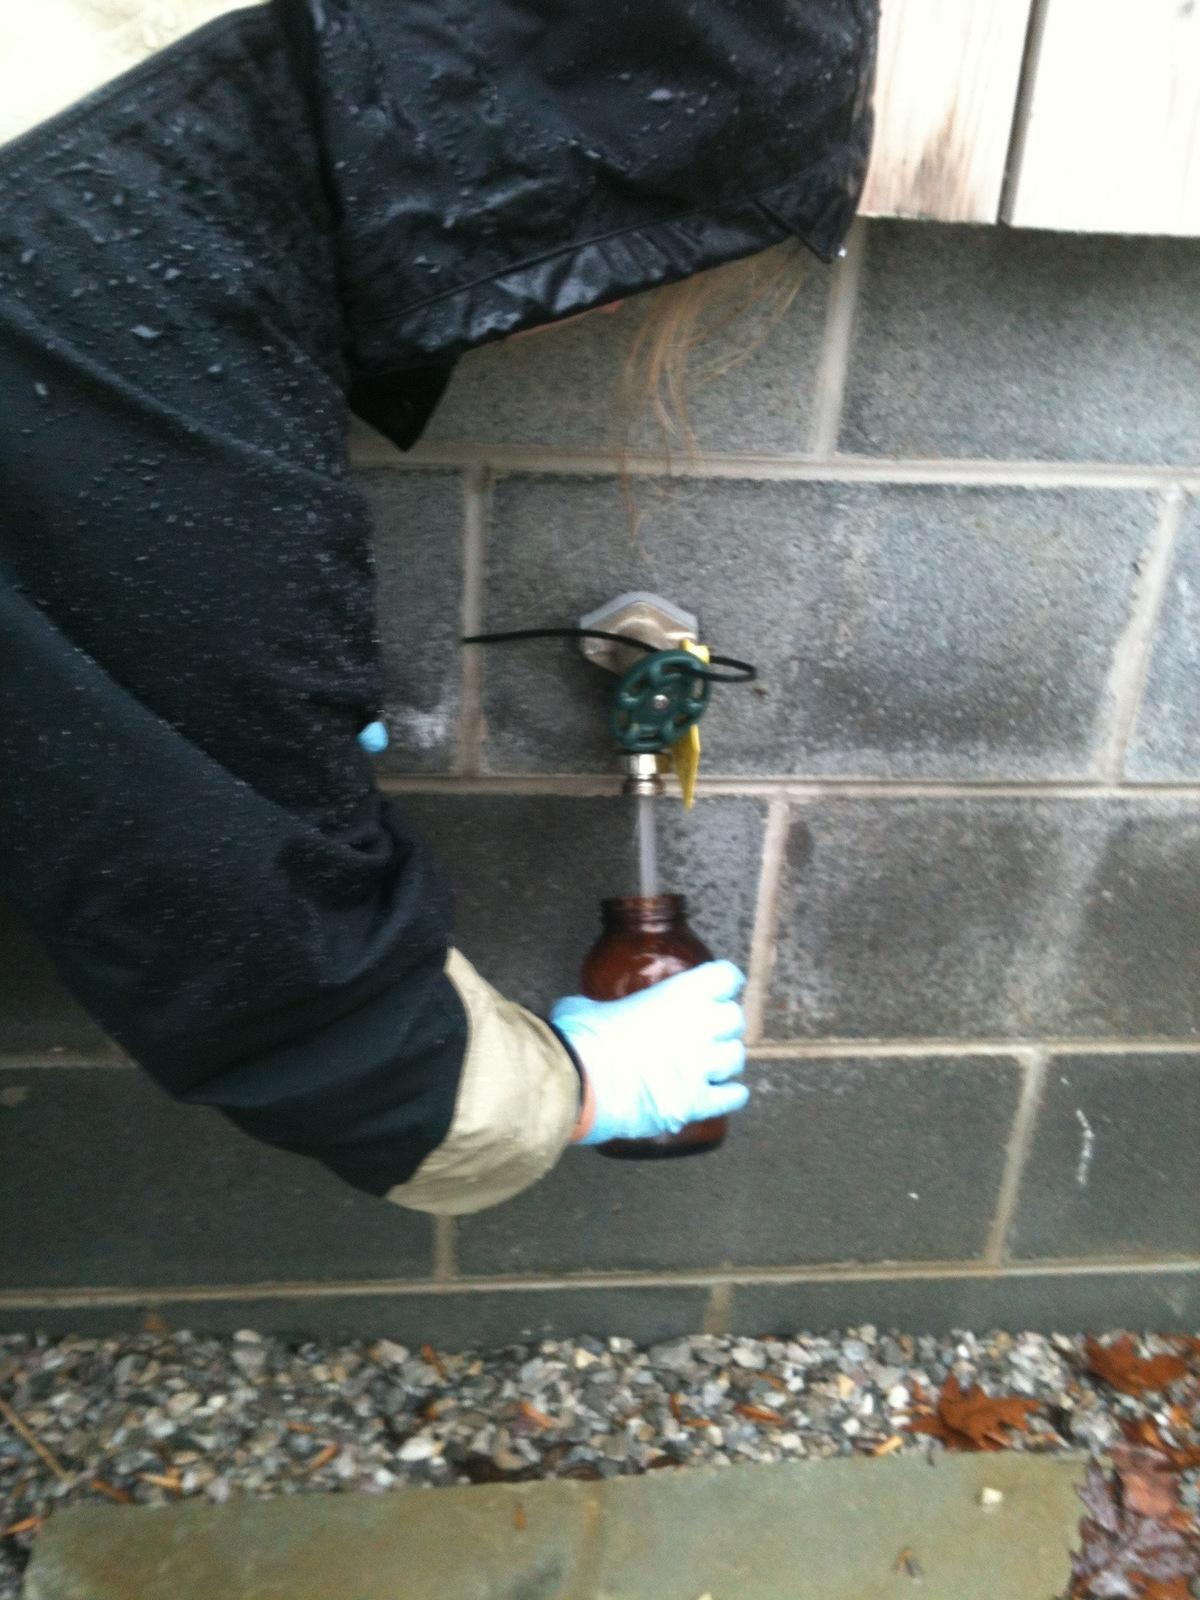 Sampling from the hose bib